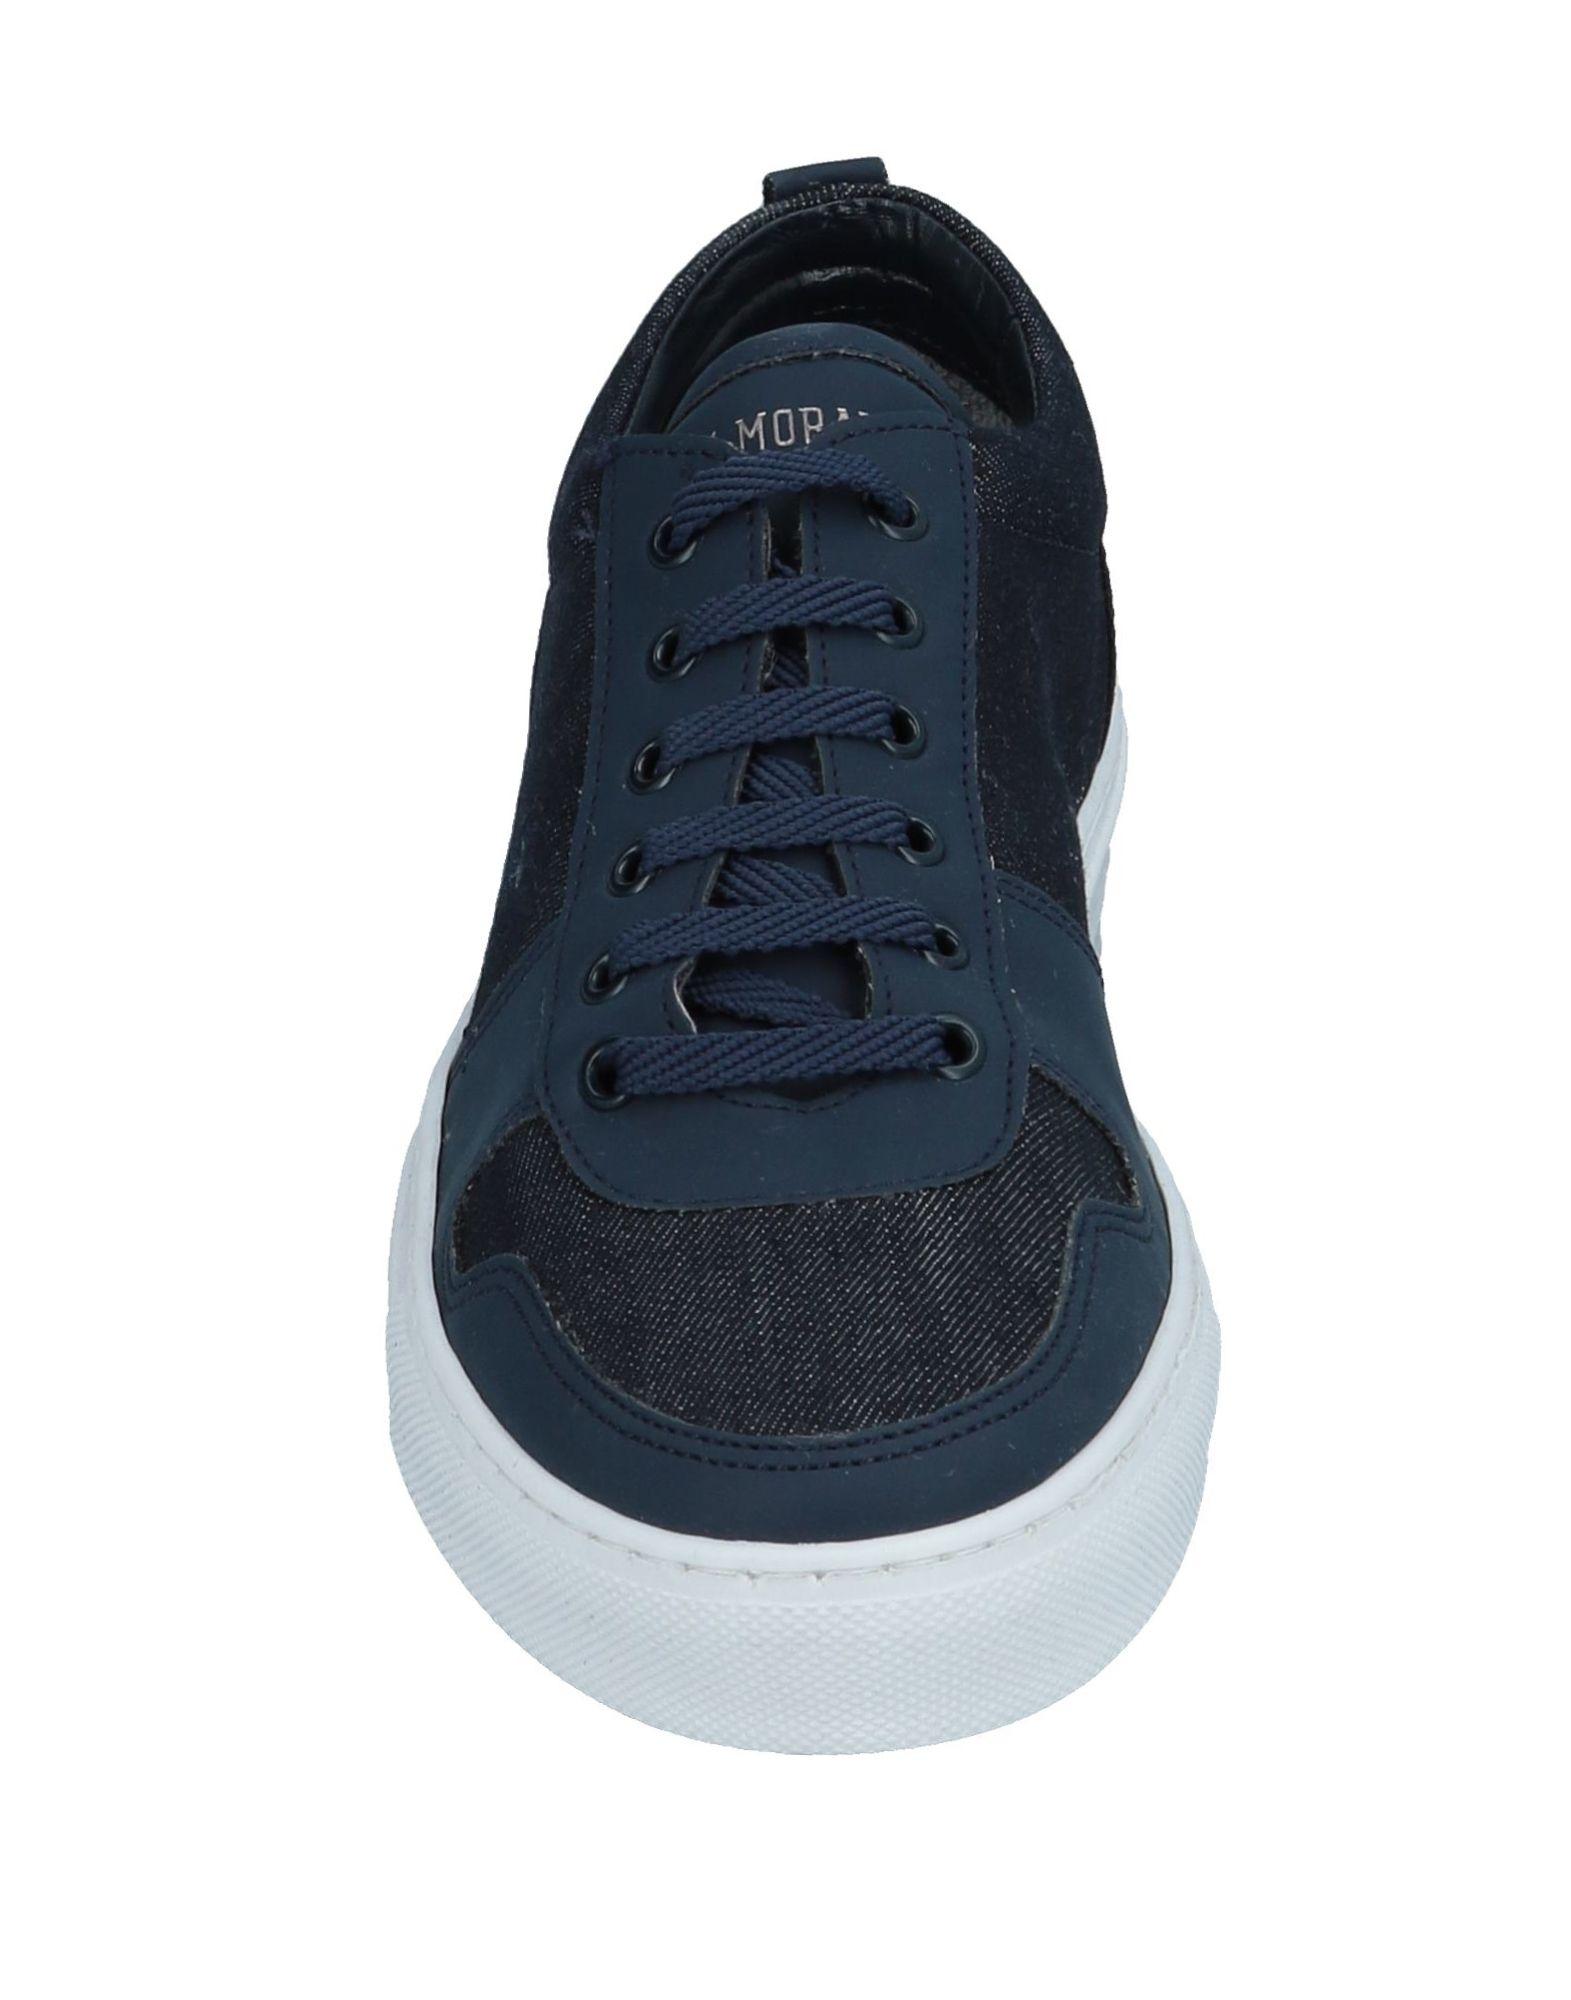 Rabatt echte Schuhe  Antony Morato Sneakers Herren  Schuhe 11548736EK 608a44